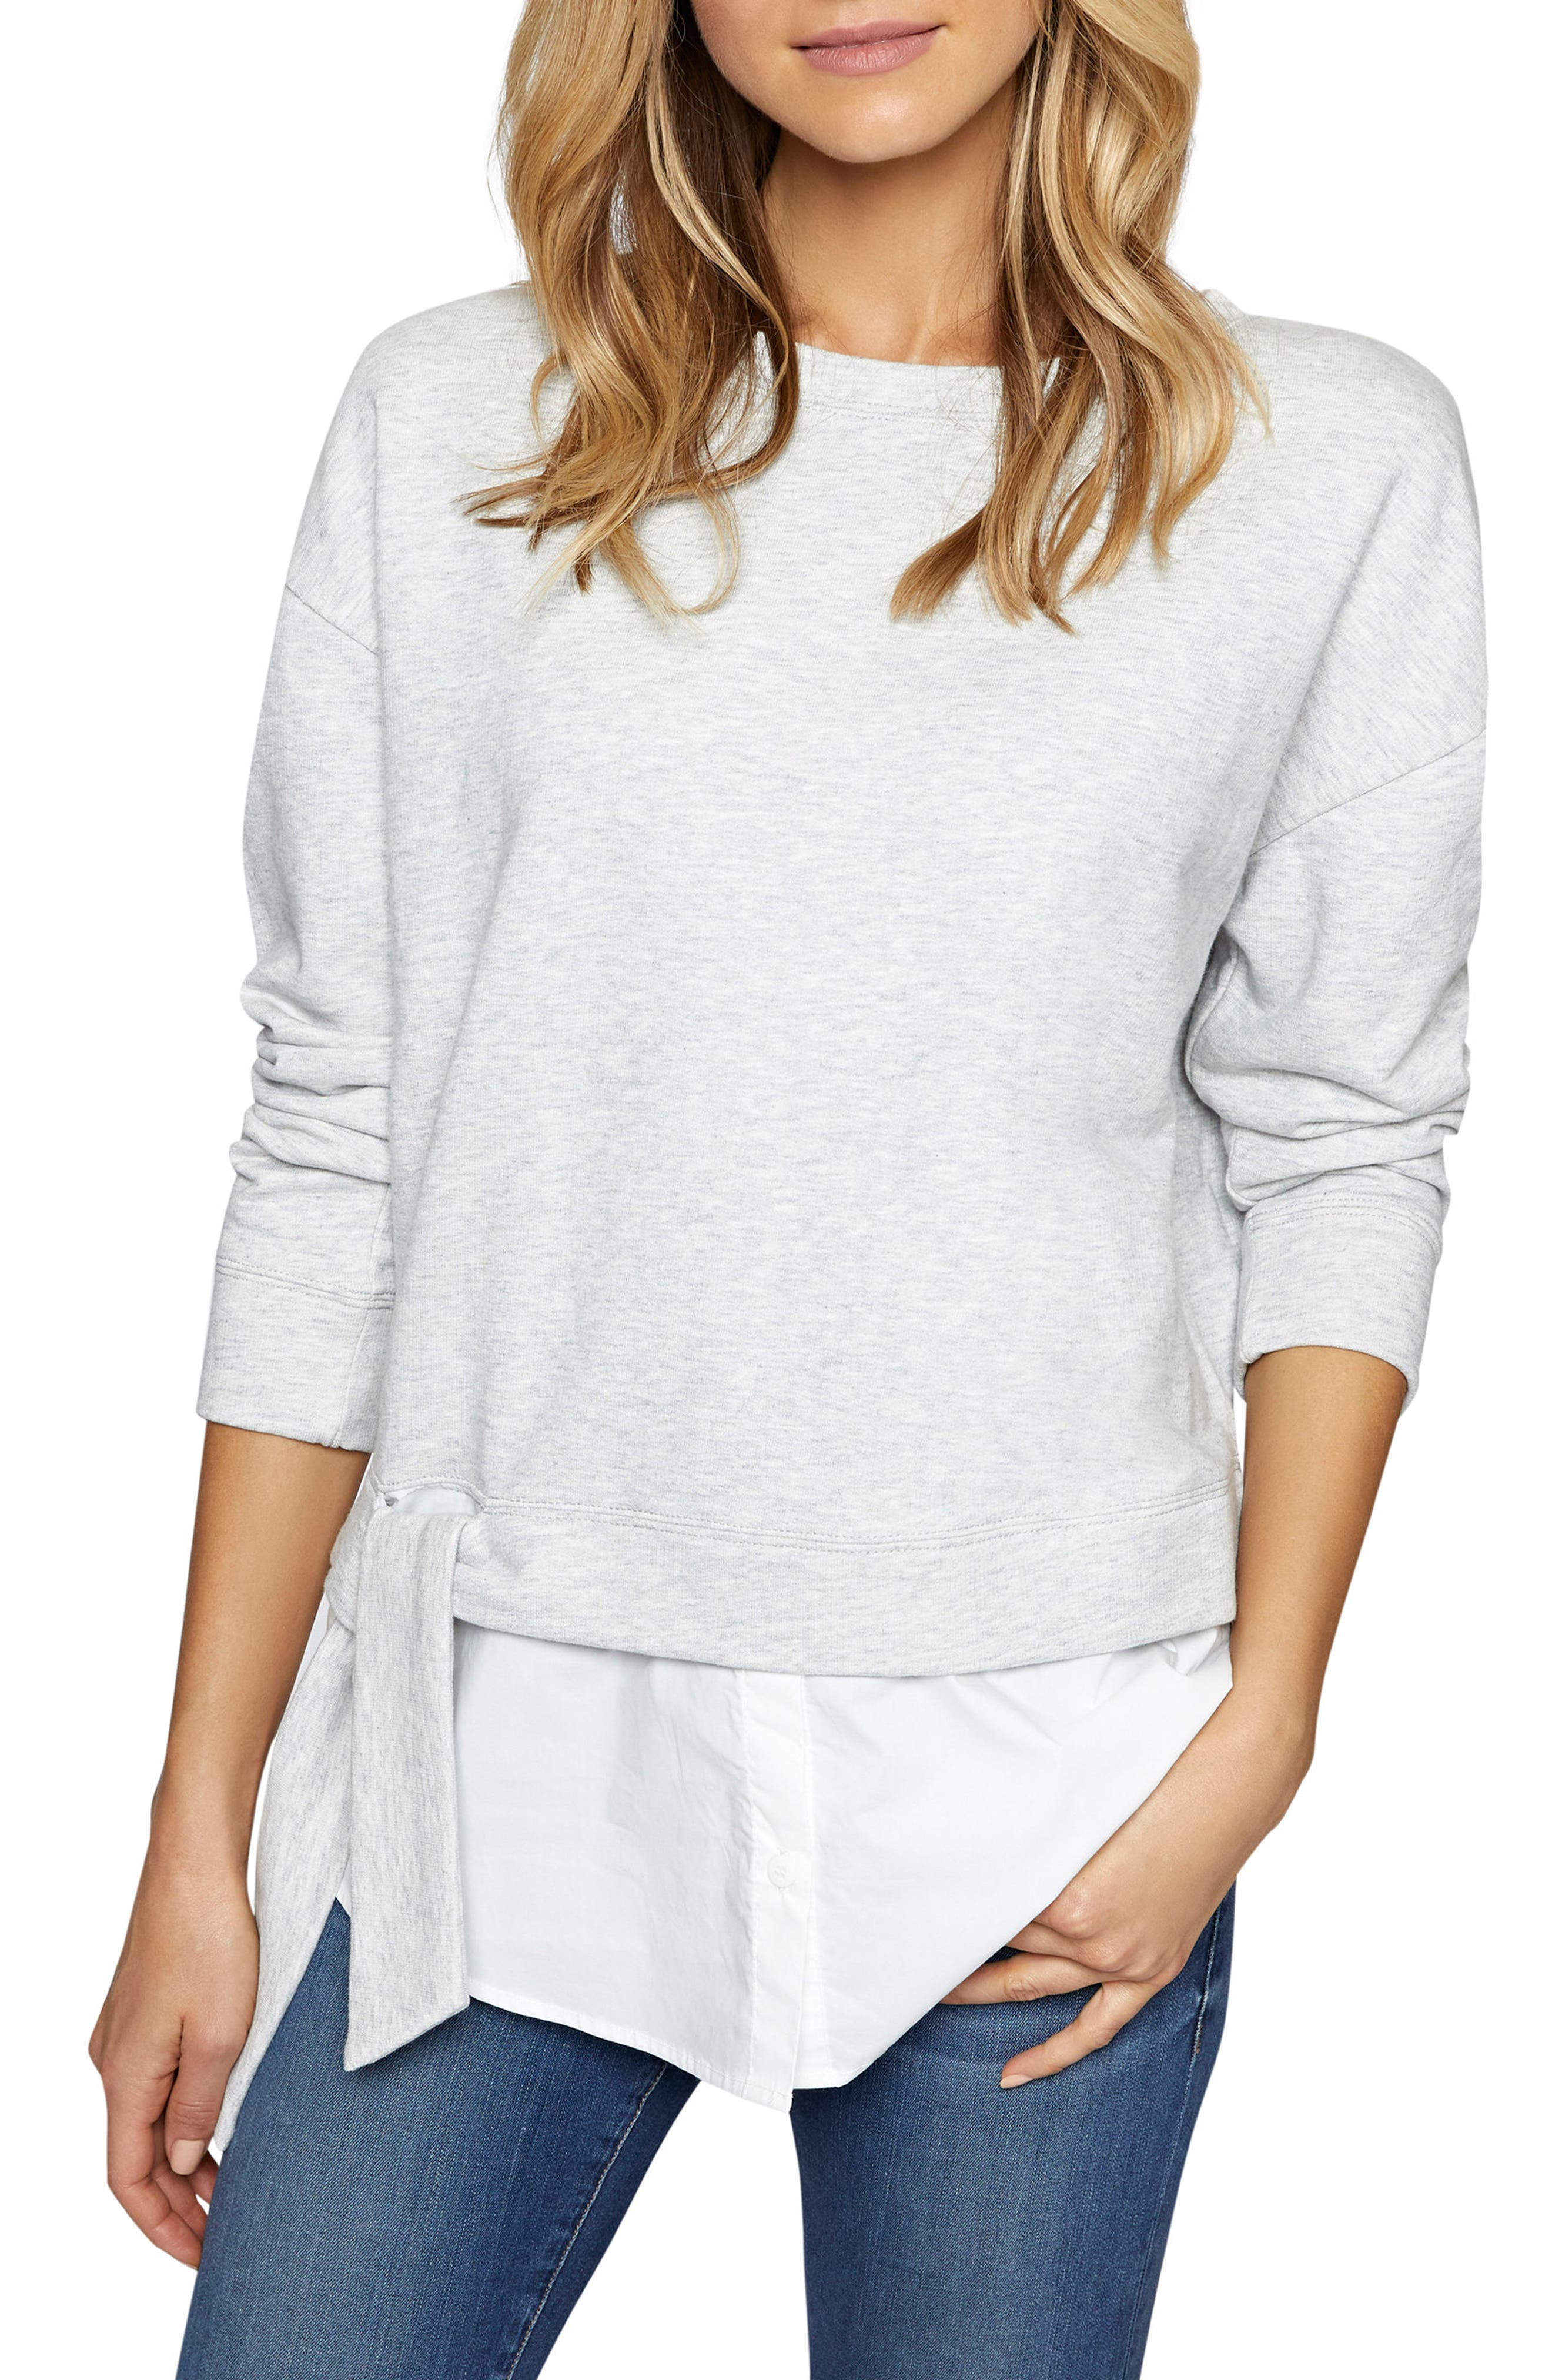 Alternate Image 1 Selected - Sanctuary Ally Layered Look Sweatshirt